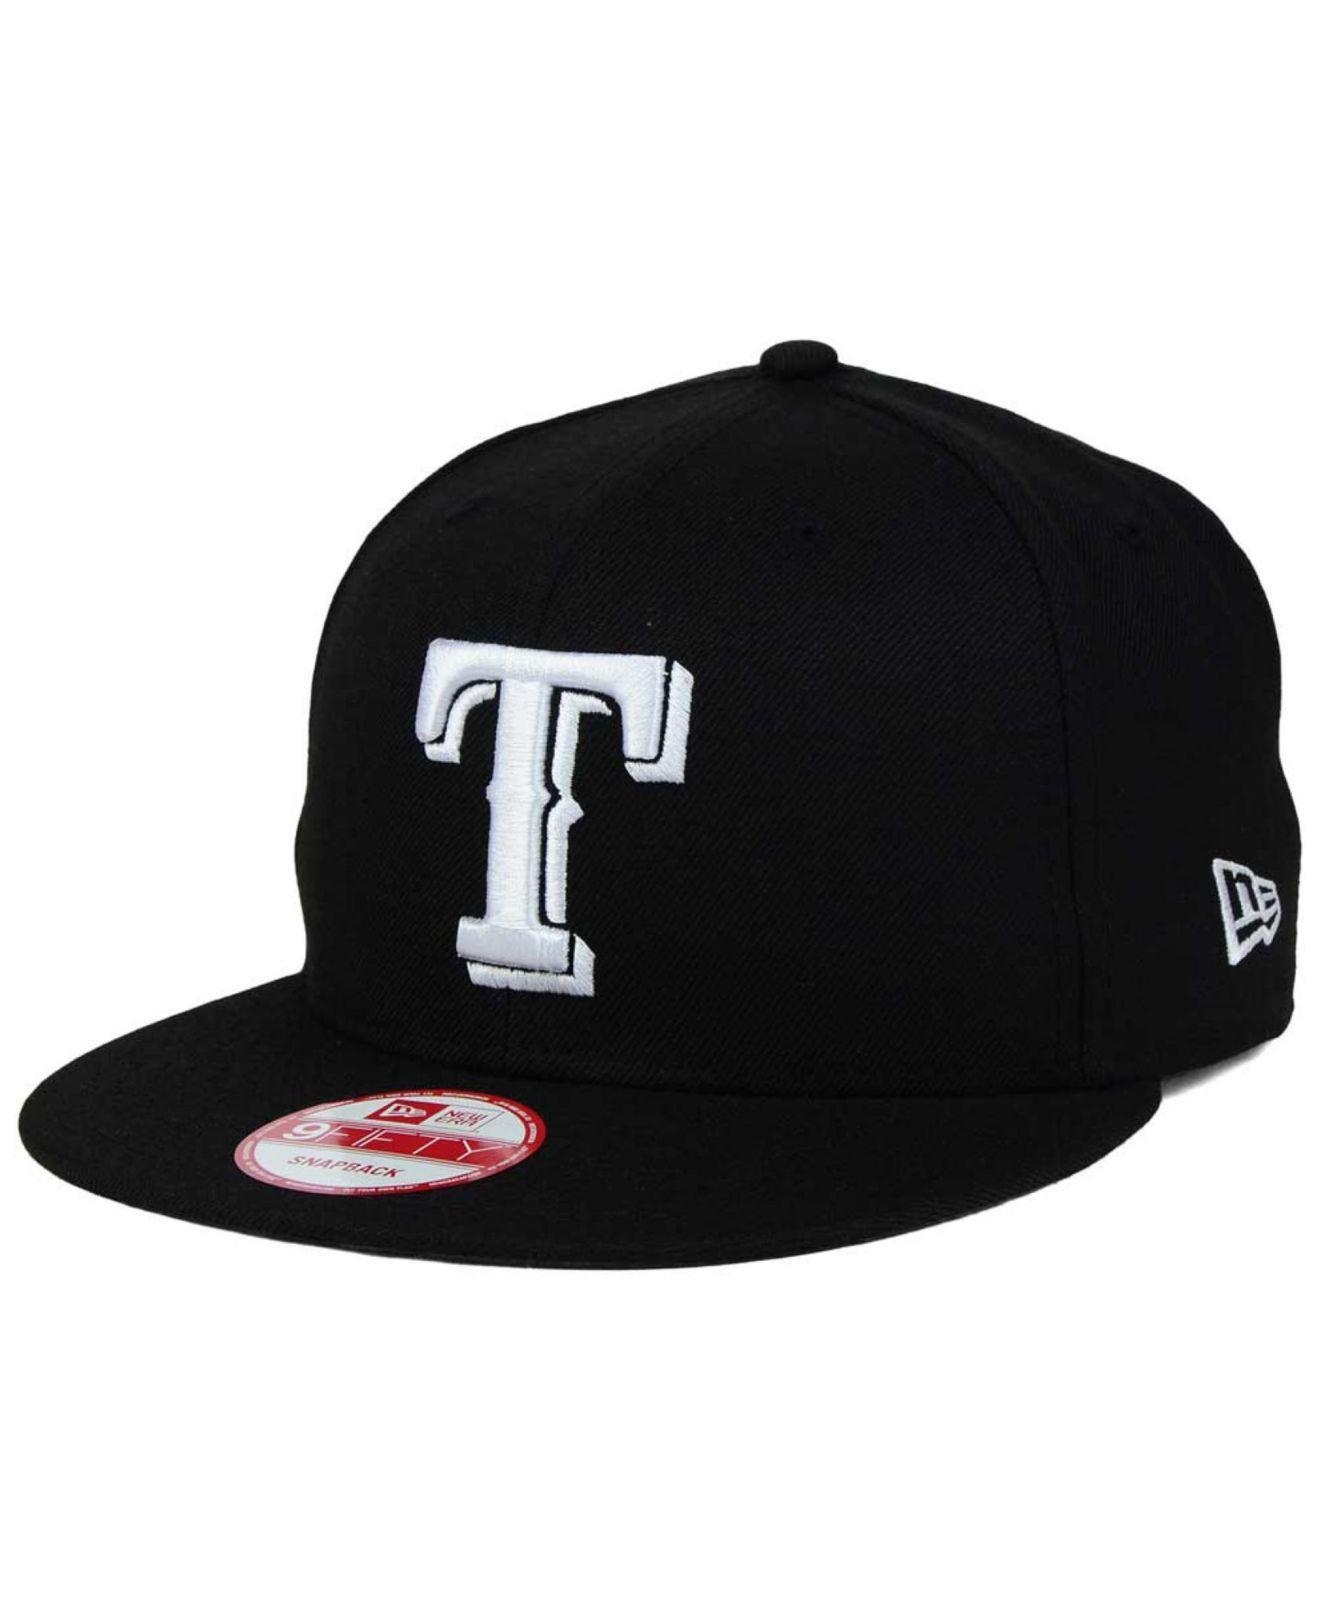 pretty nice 52861 2b029 KTZ - Black Texas Rangers B-dub 9fifty Snapback Cap for Men - Lyst. View  fullscreen